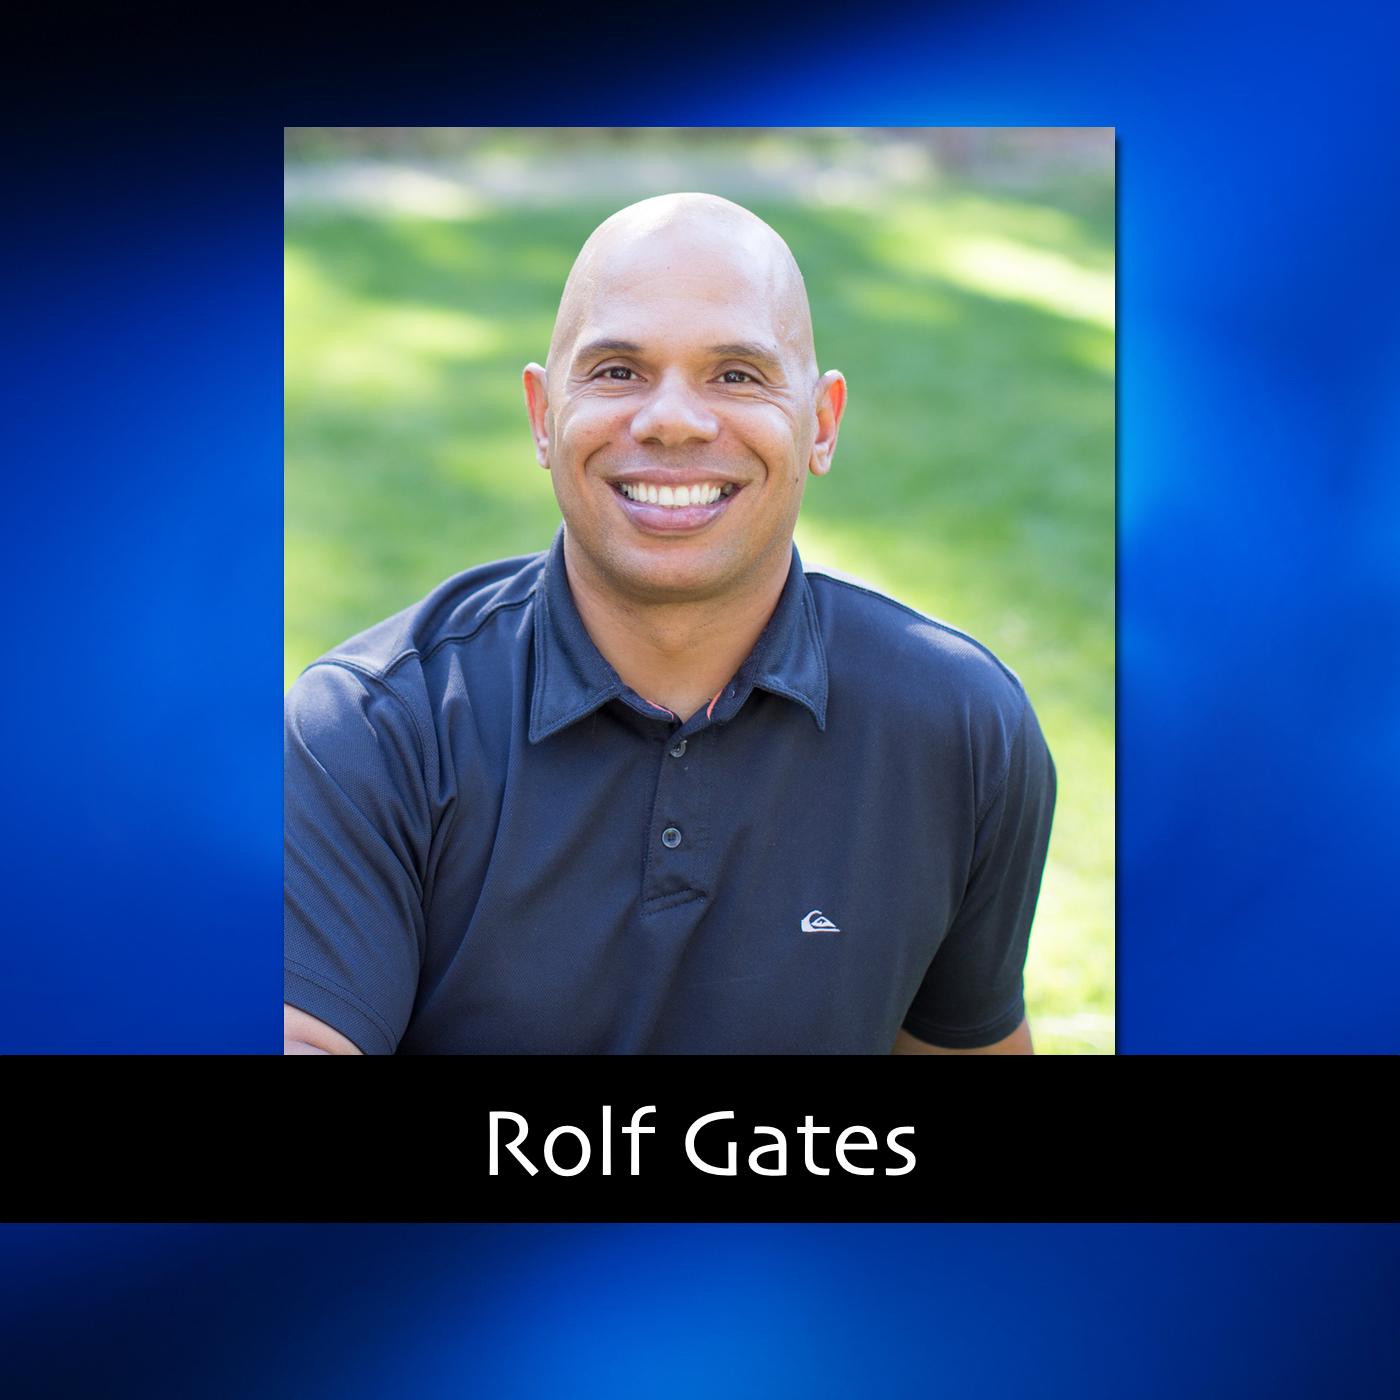 Rolf Gates Thumb.jpg